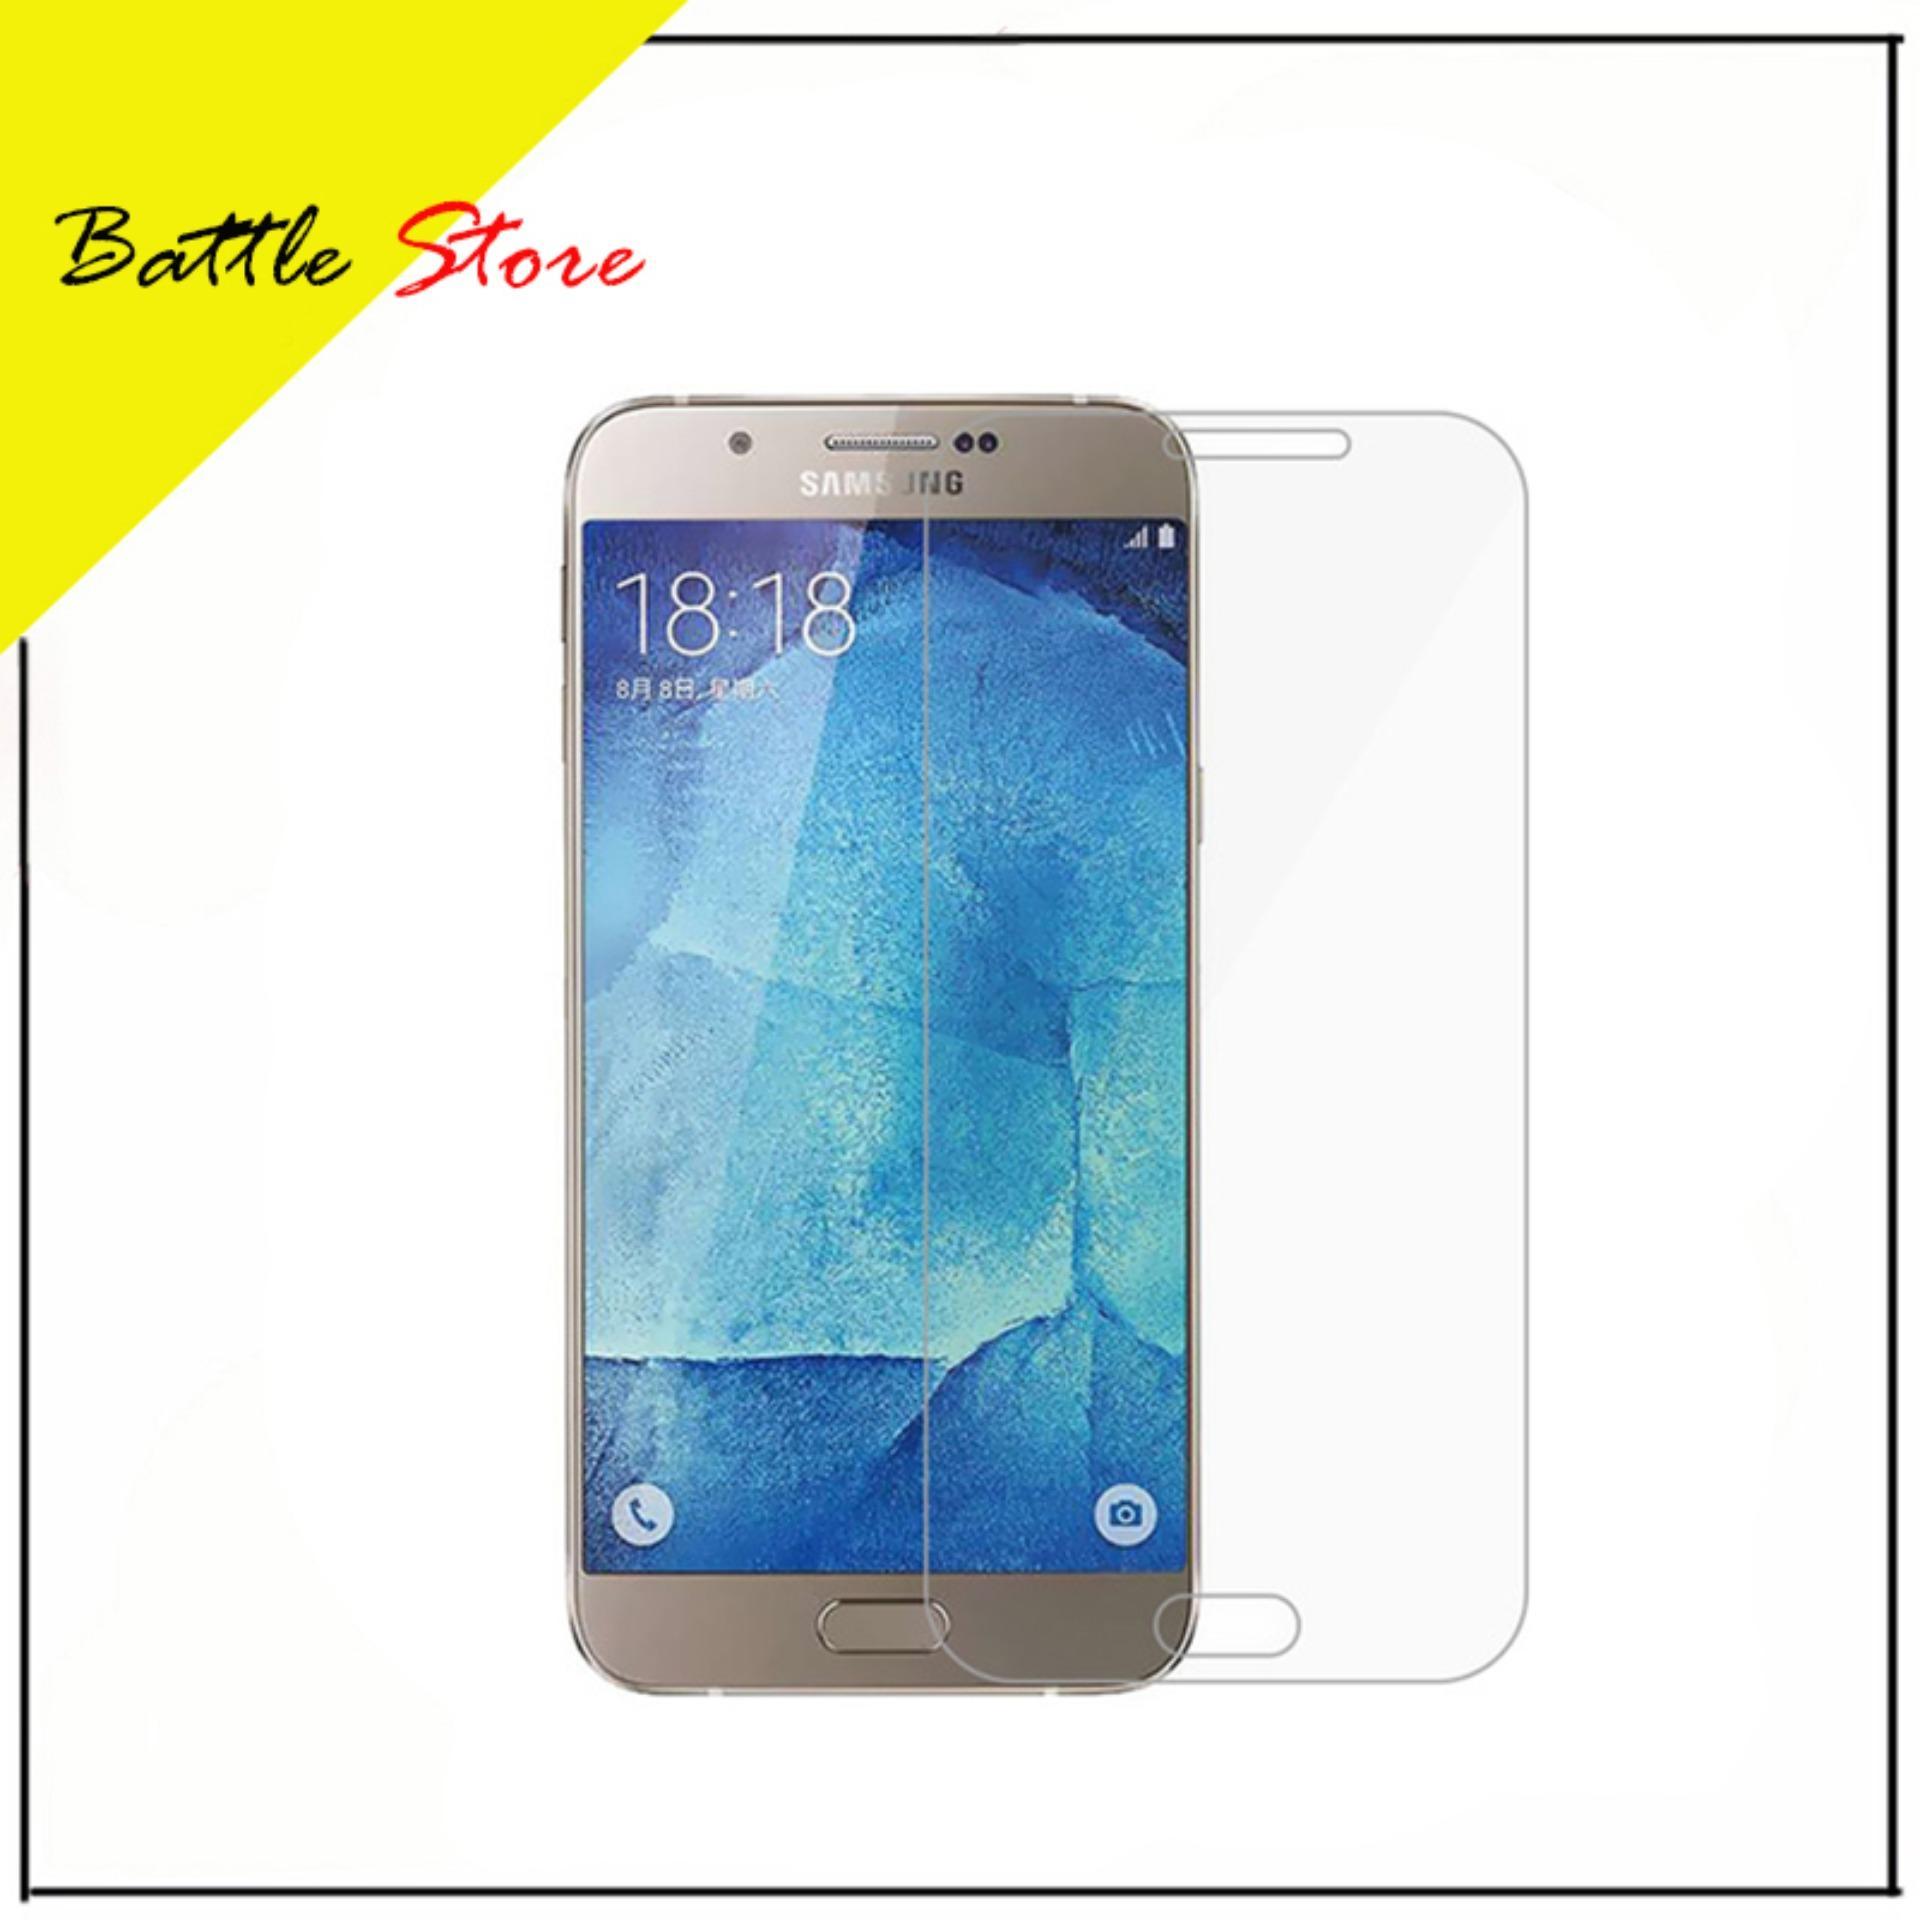 Kehebatan Lenovo P780 4g Lte Smile Screen Protector Tempered Glass Xiaomi Redmi4x Clear Samsung Galaxy A8 Premium Anti Gores Kaca White